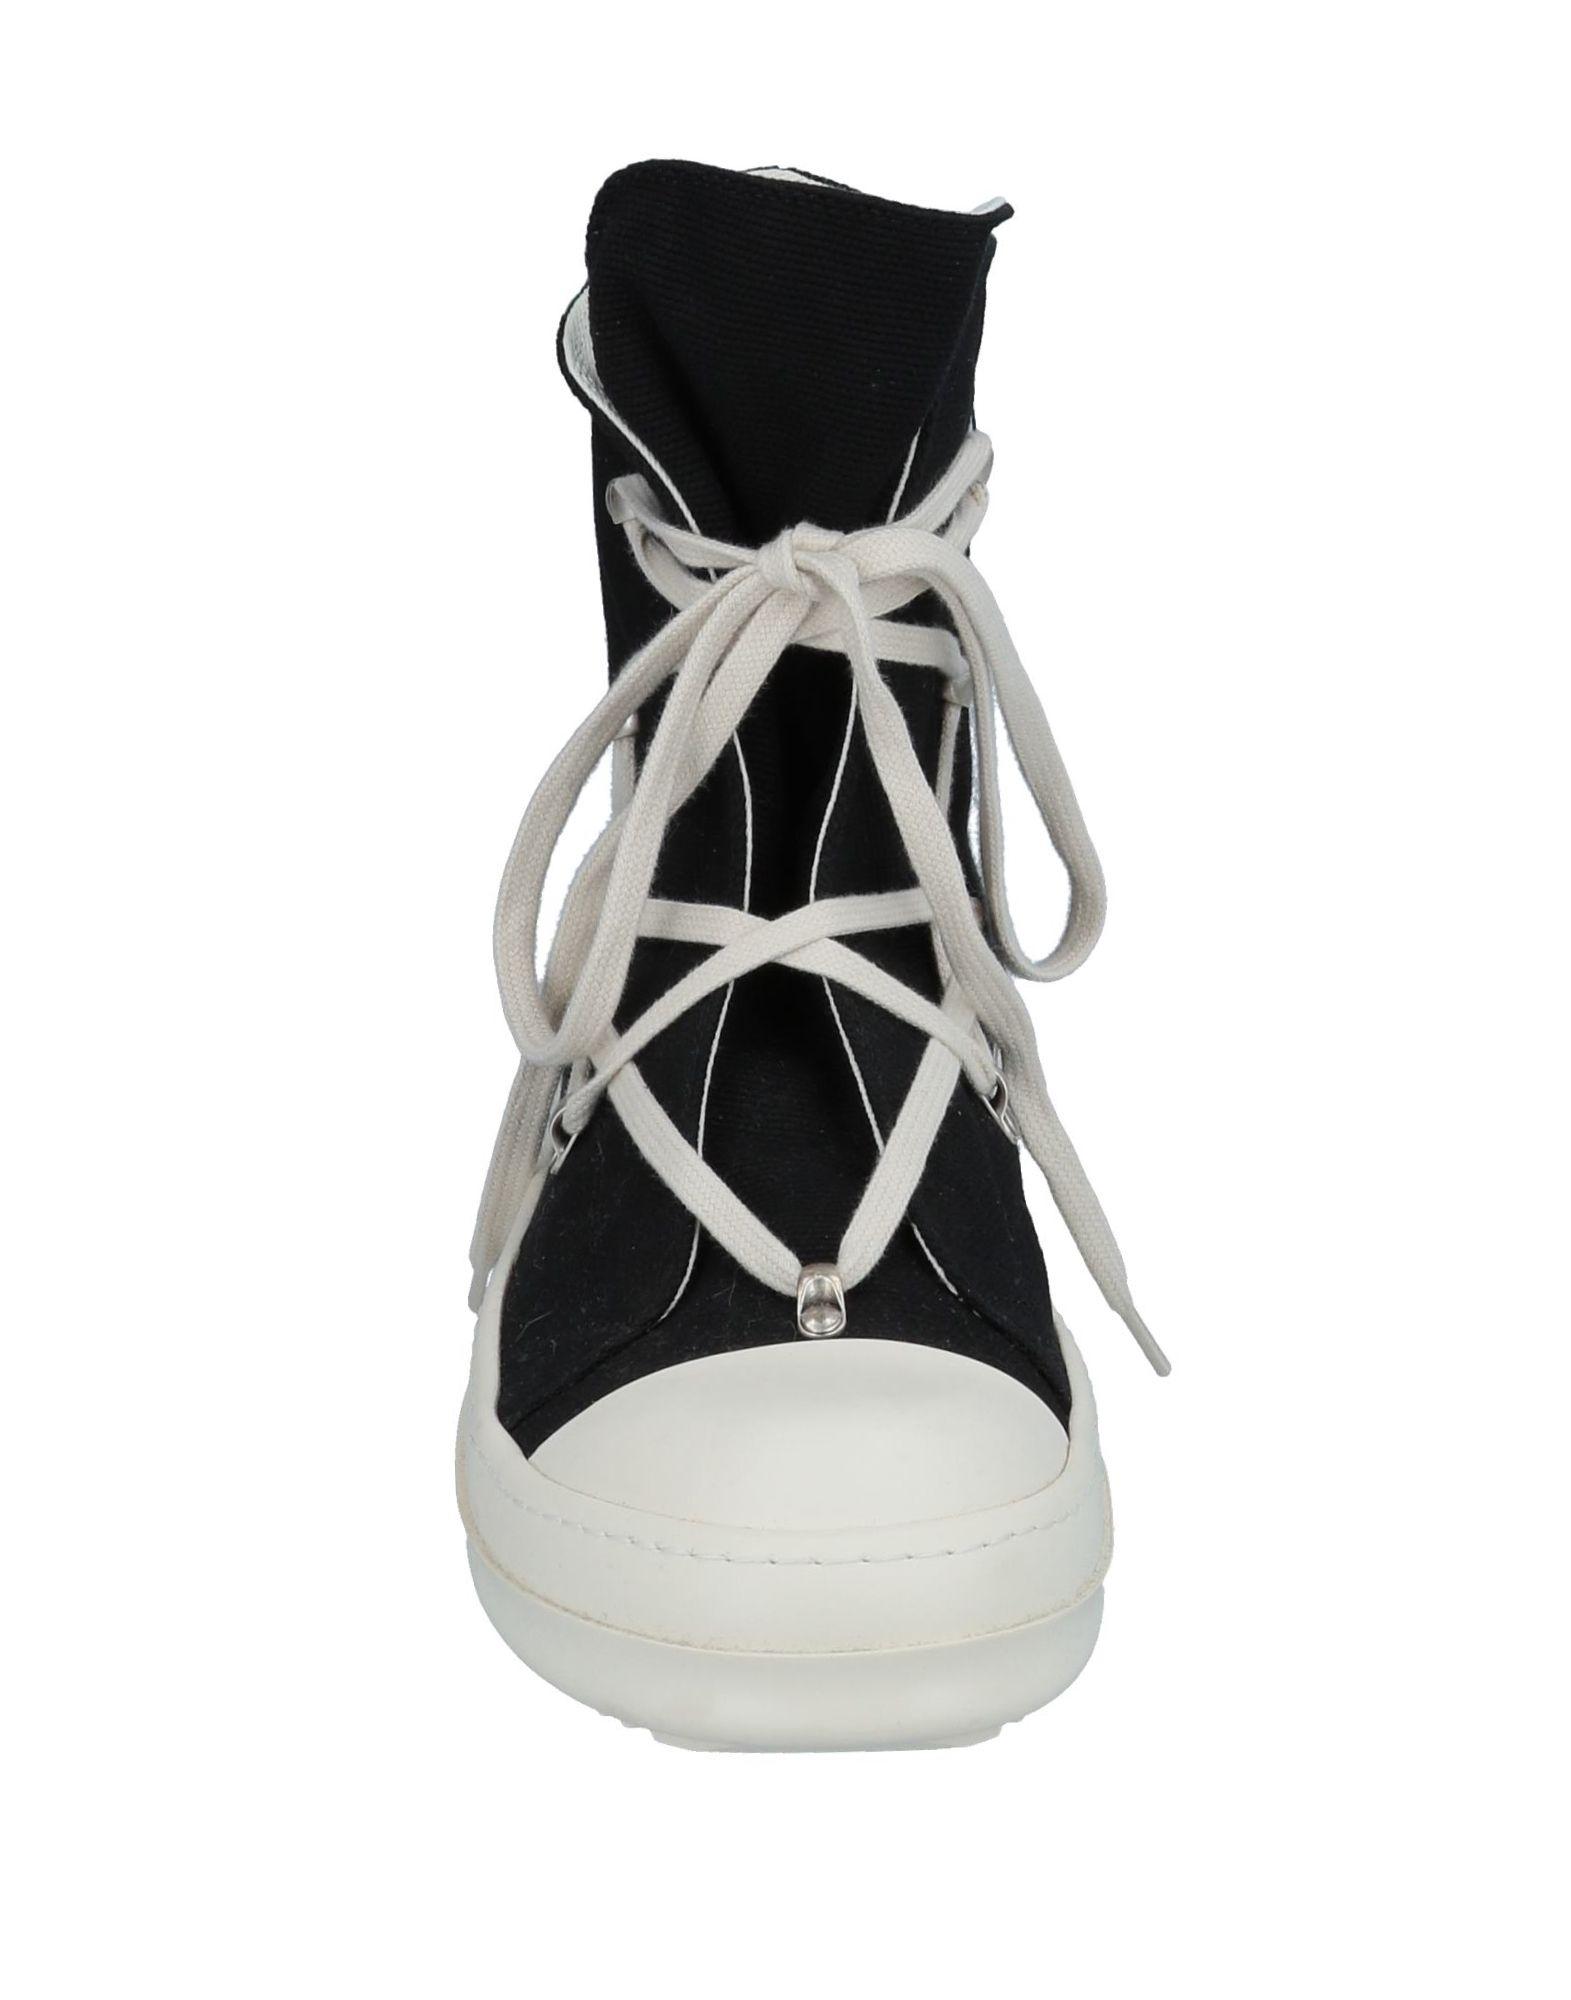 Drkshdw By Rick Owens Gute Sneakers Herren  11560322MW Gute Owens Qualität beliebte Schuhe 6c7de6